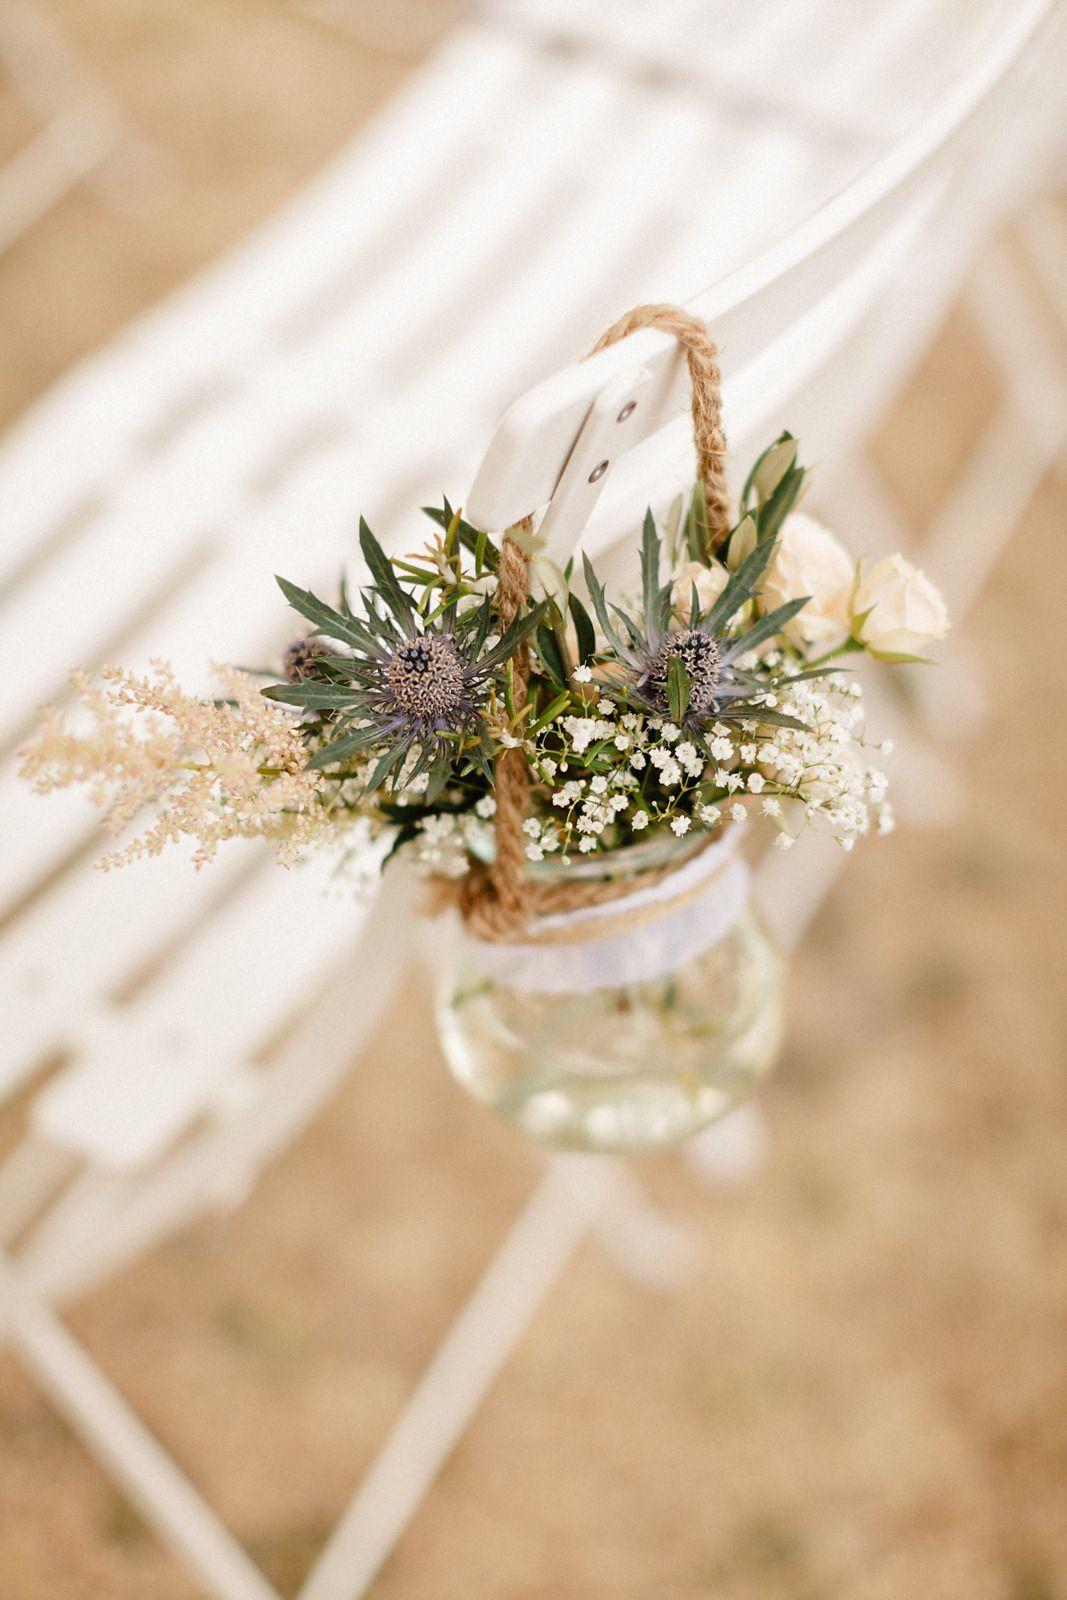 Lavender decor for wedding French Bridal Boudoir  Provence Weddings and Wedding